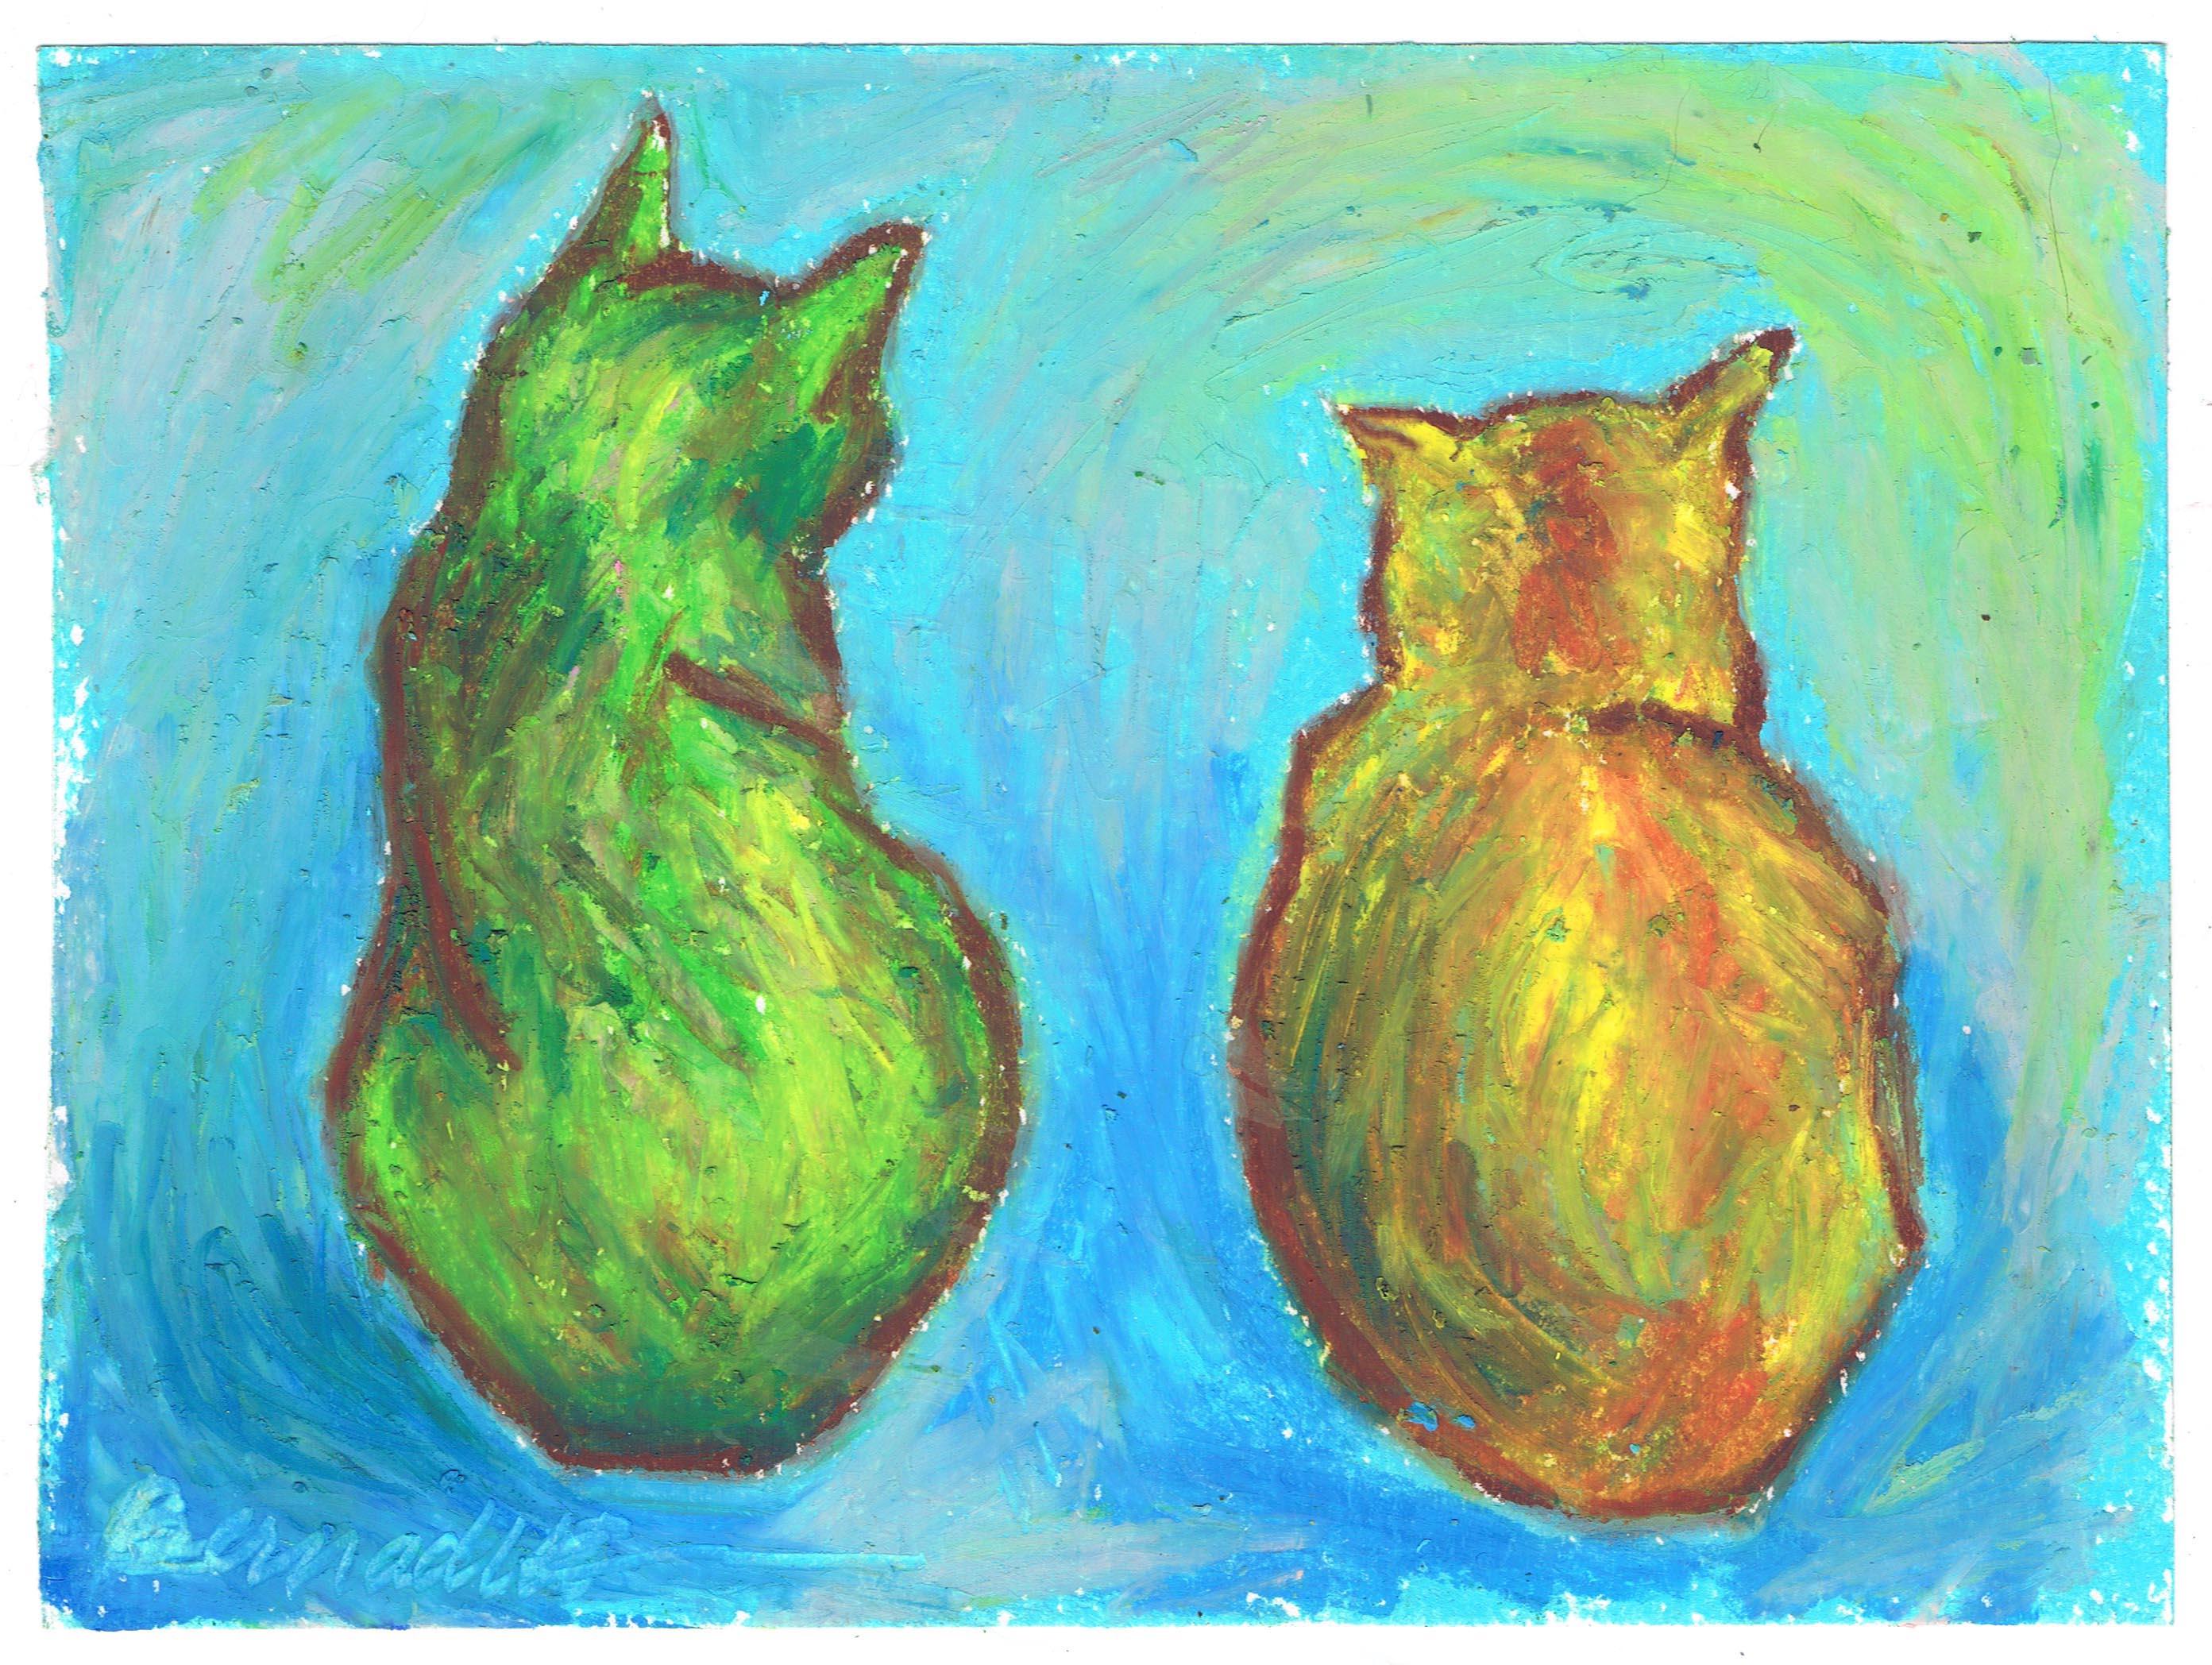 revised oil pastel sketch